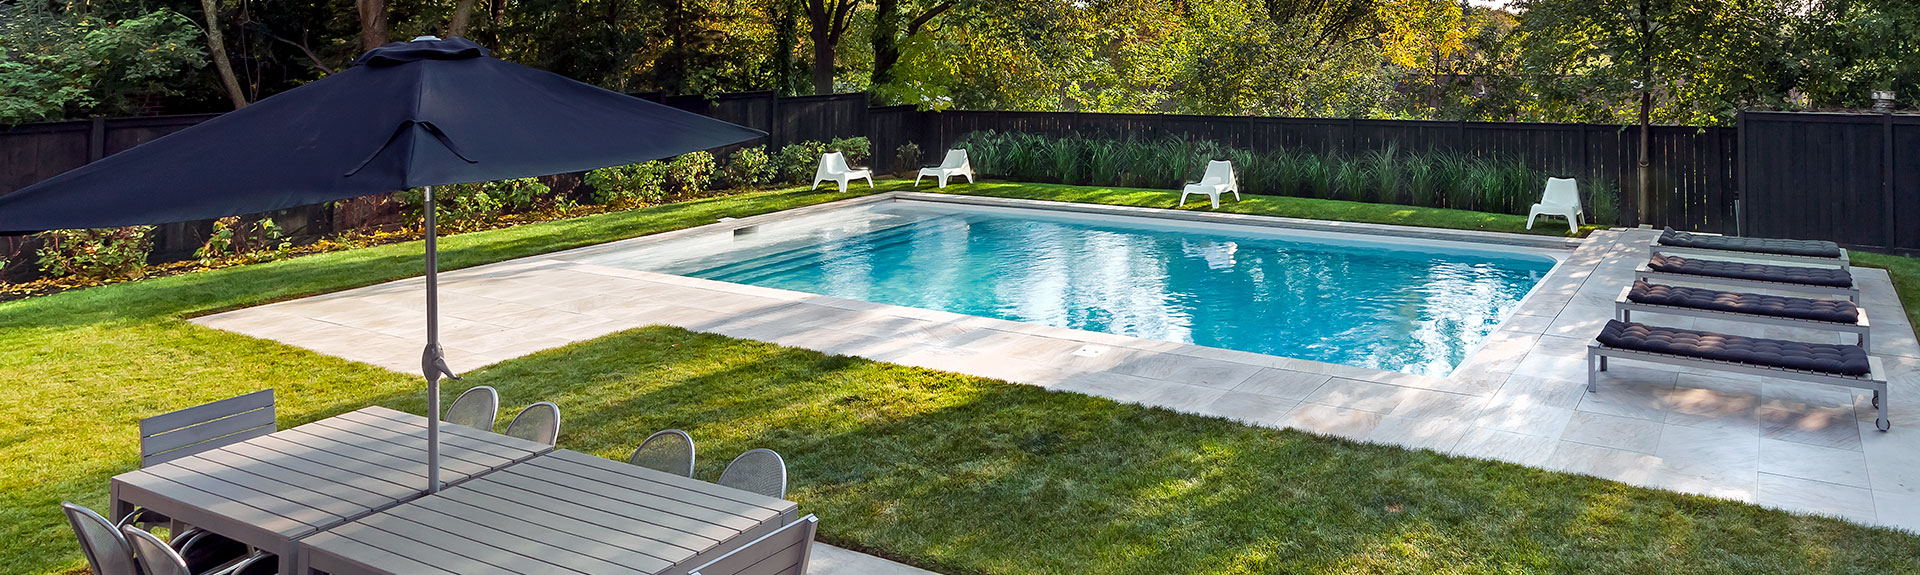 Cheap Swimming Pools Photos